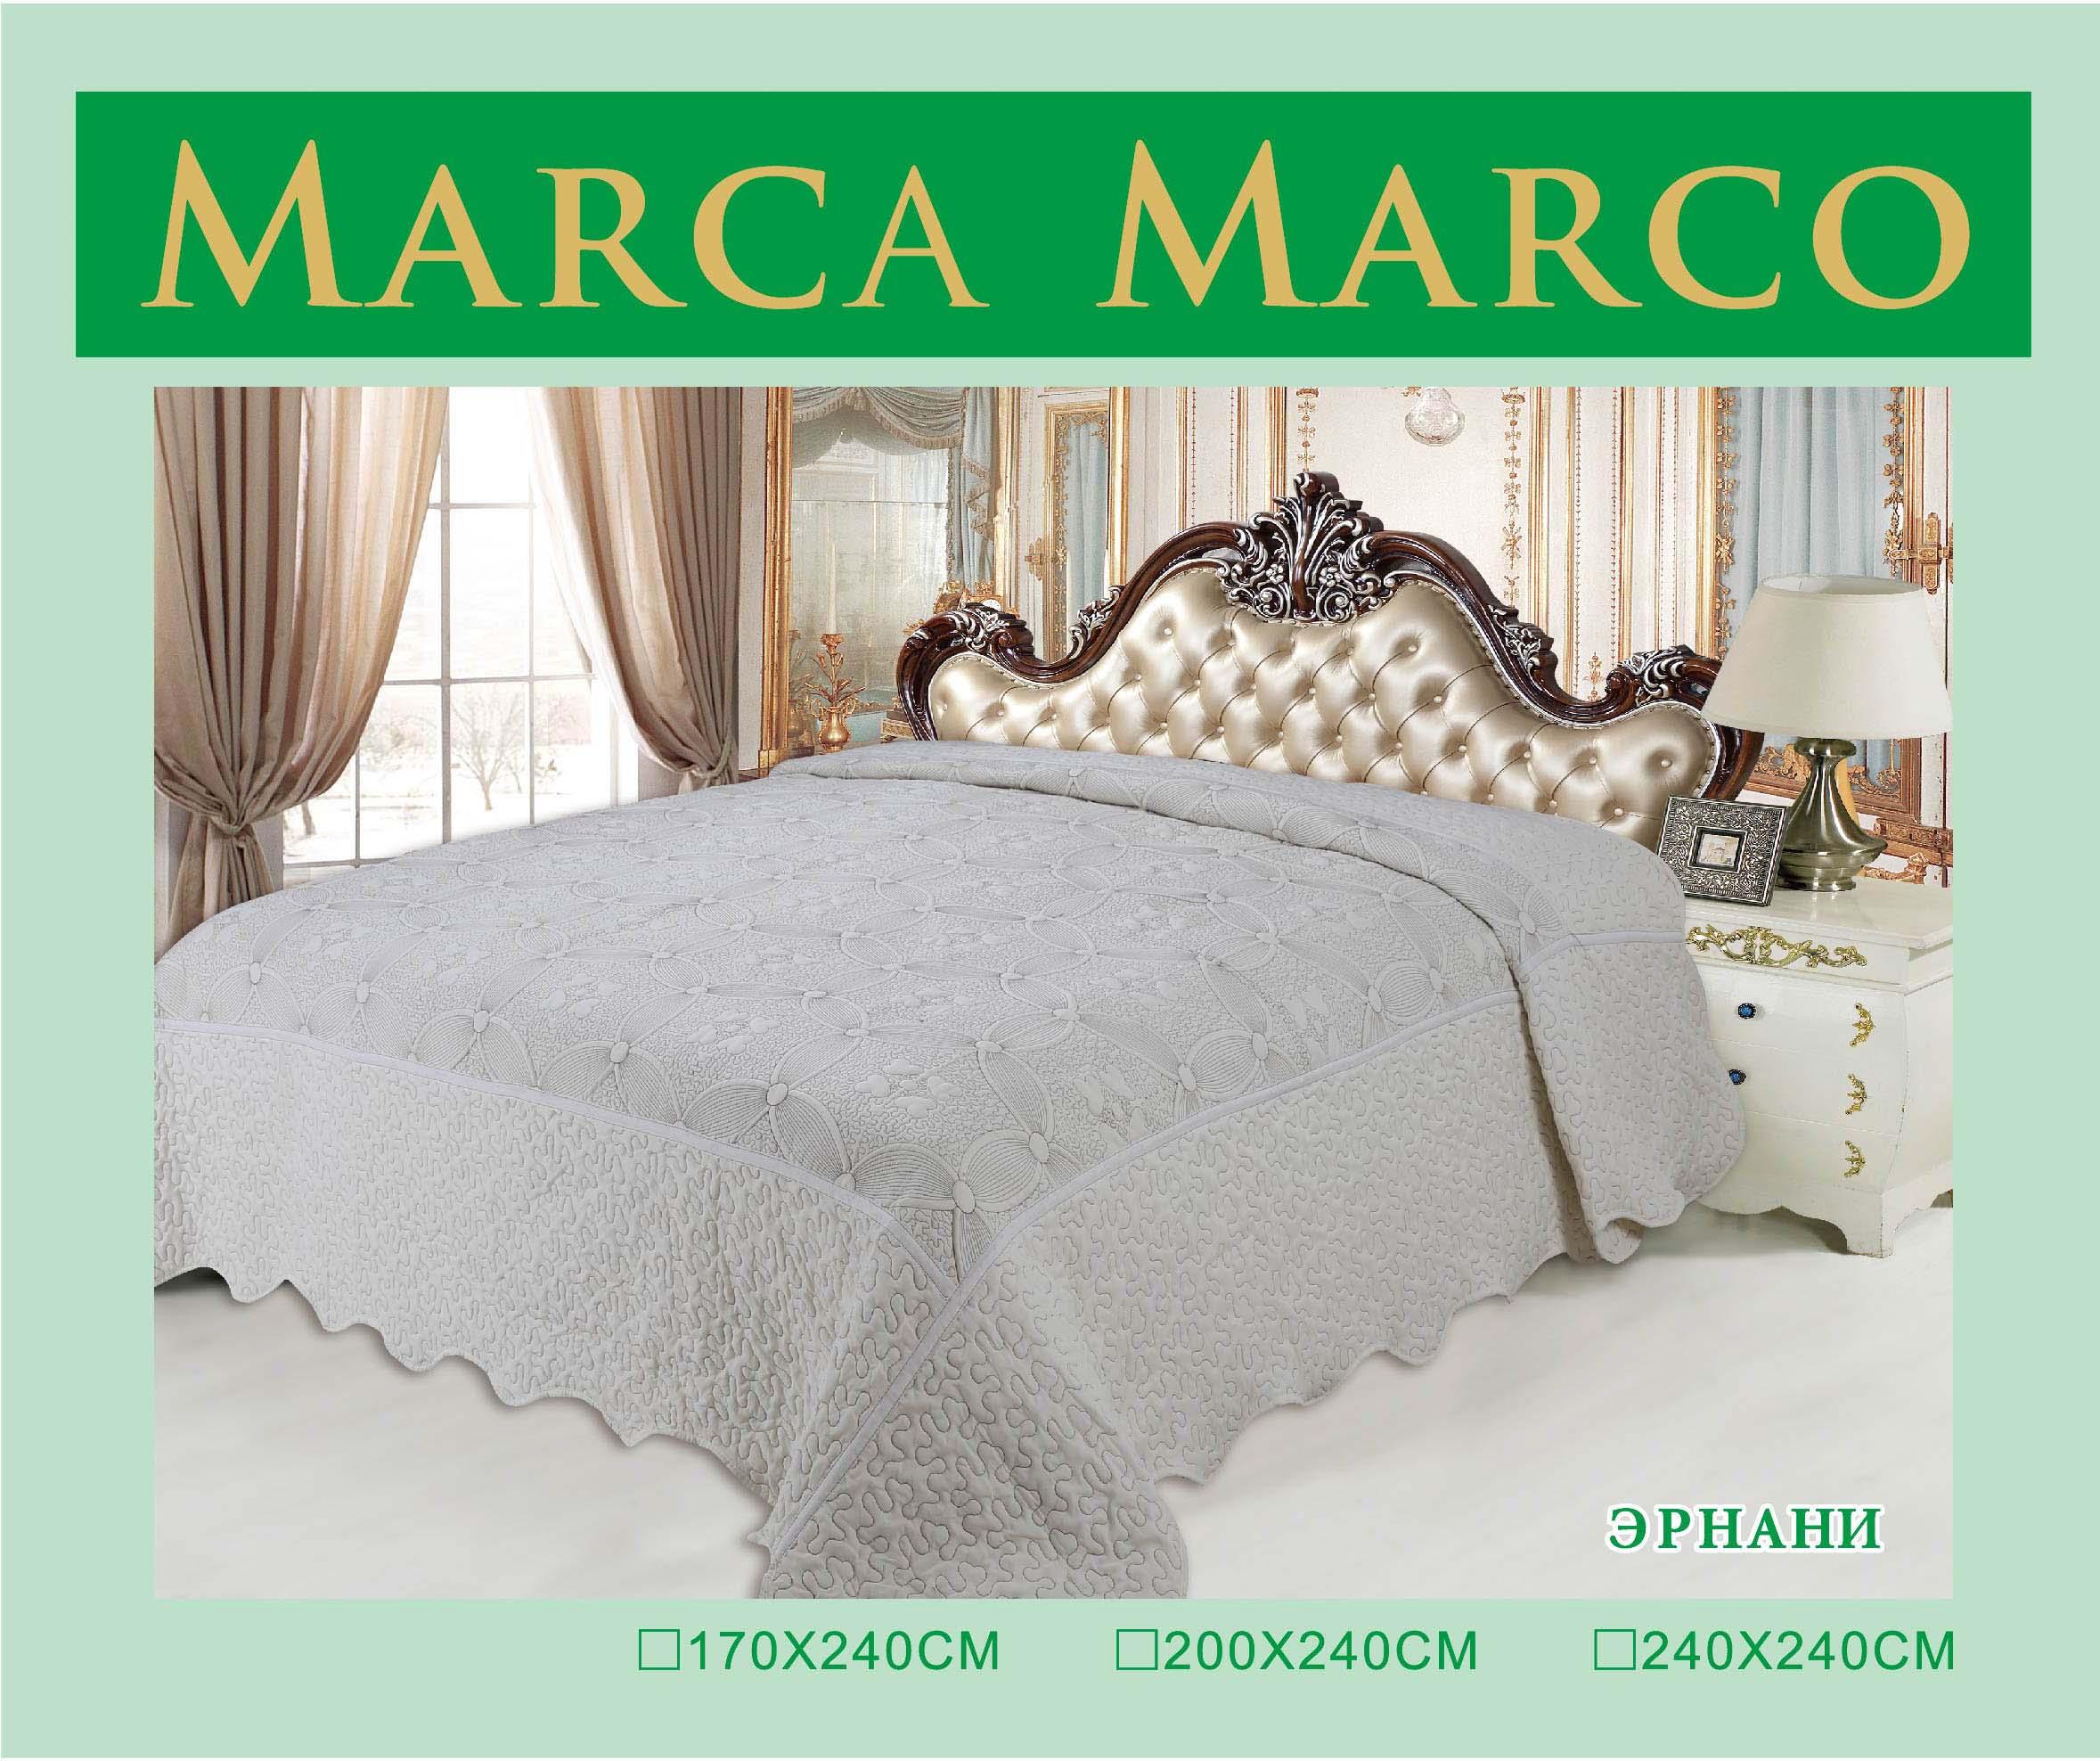 Покрывало MАRCA MARCO Покрывало Эрнани (170х240 см) dorothy s нome покрывало принт мурманск 2 сп 170х240 микрофибра стежка